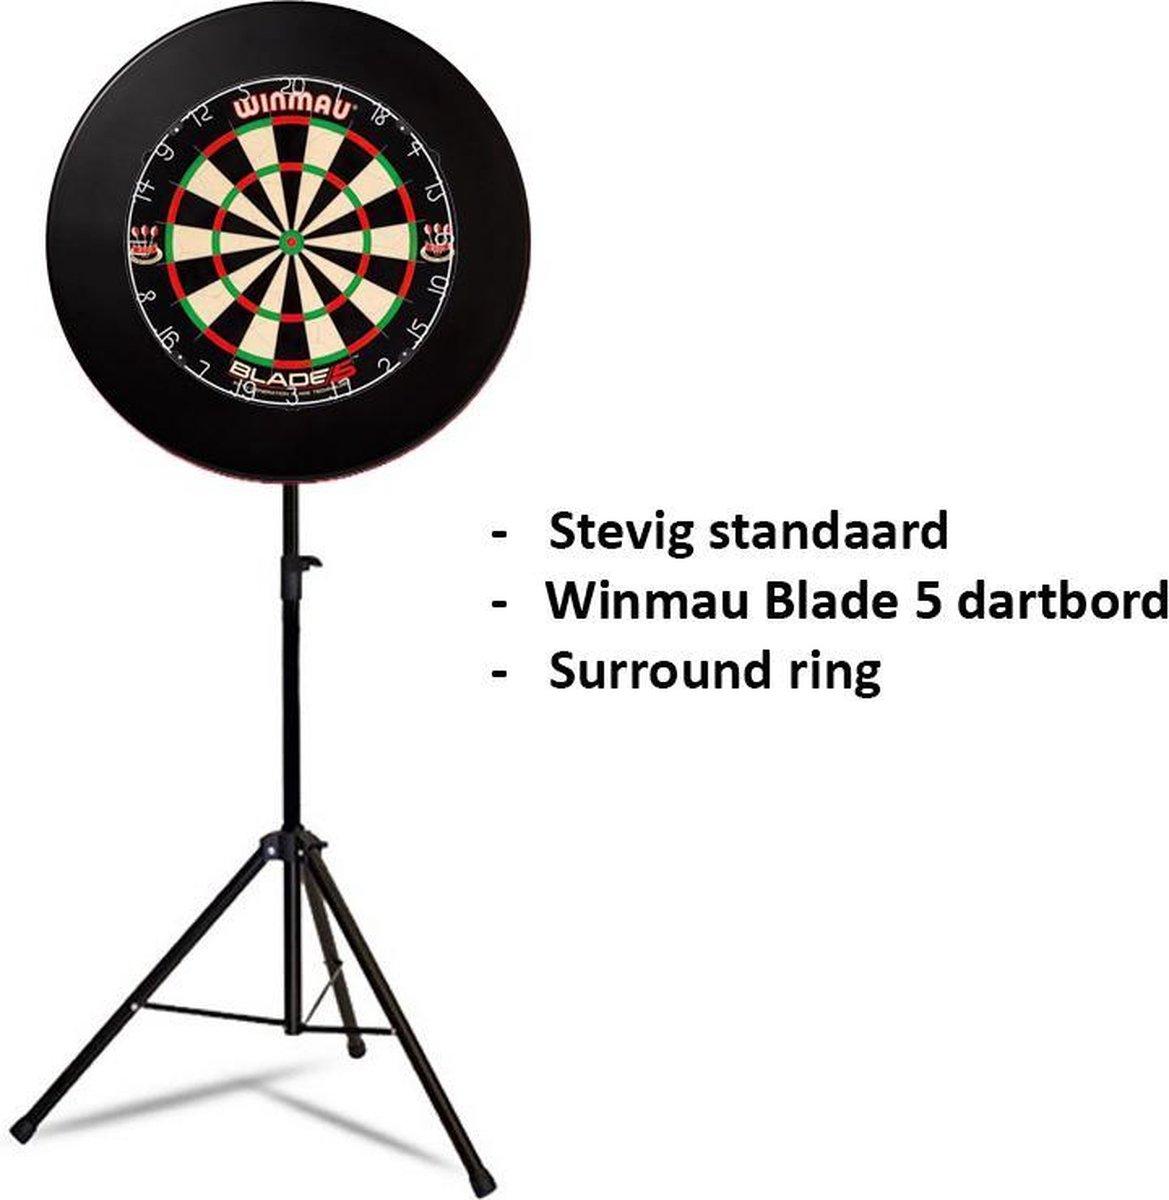 Dragon darts - Portable dartbord standaard pakket - inclusief Winmau Blade 5 - dartbord - surround ring - zwart